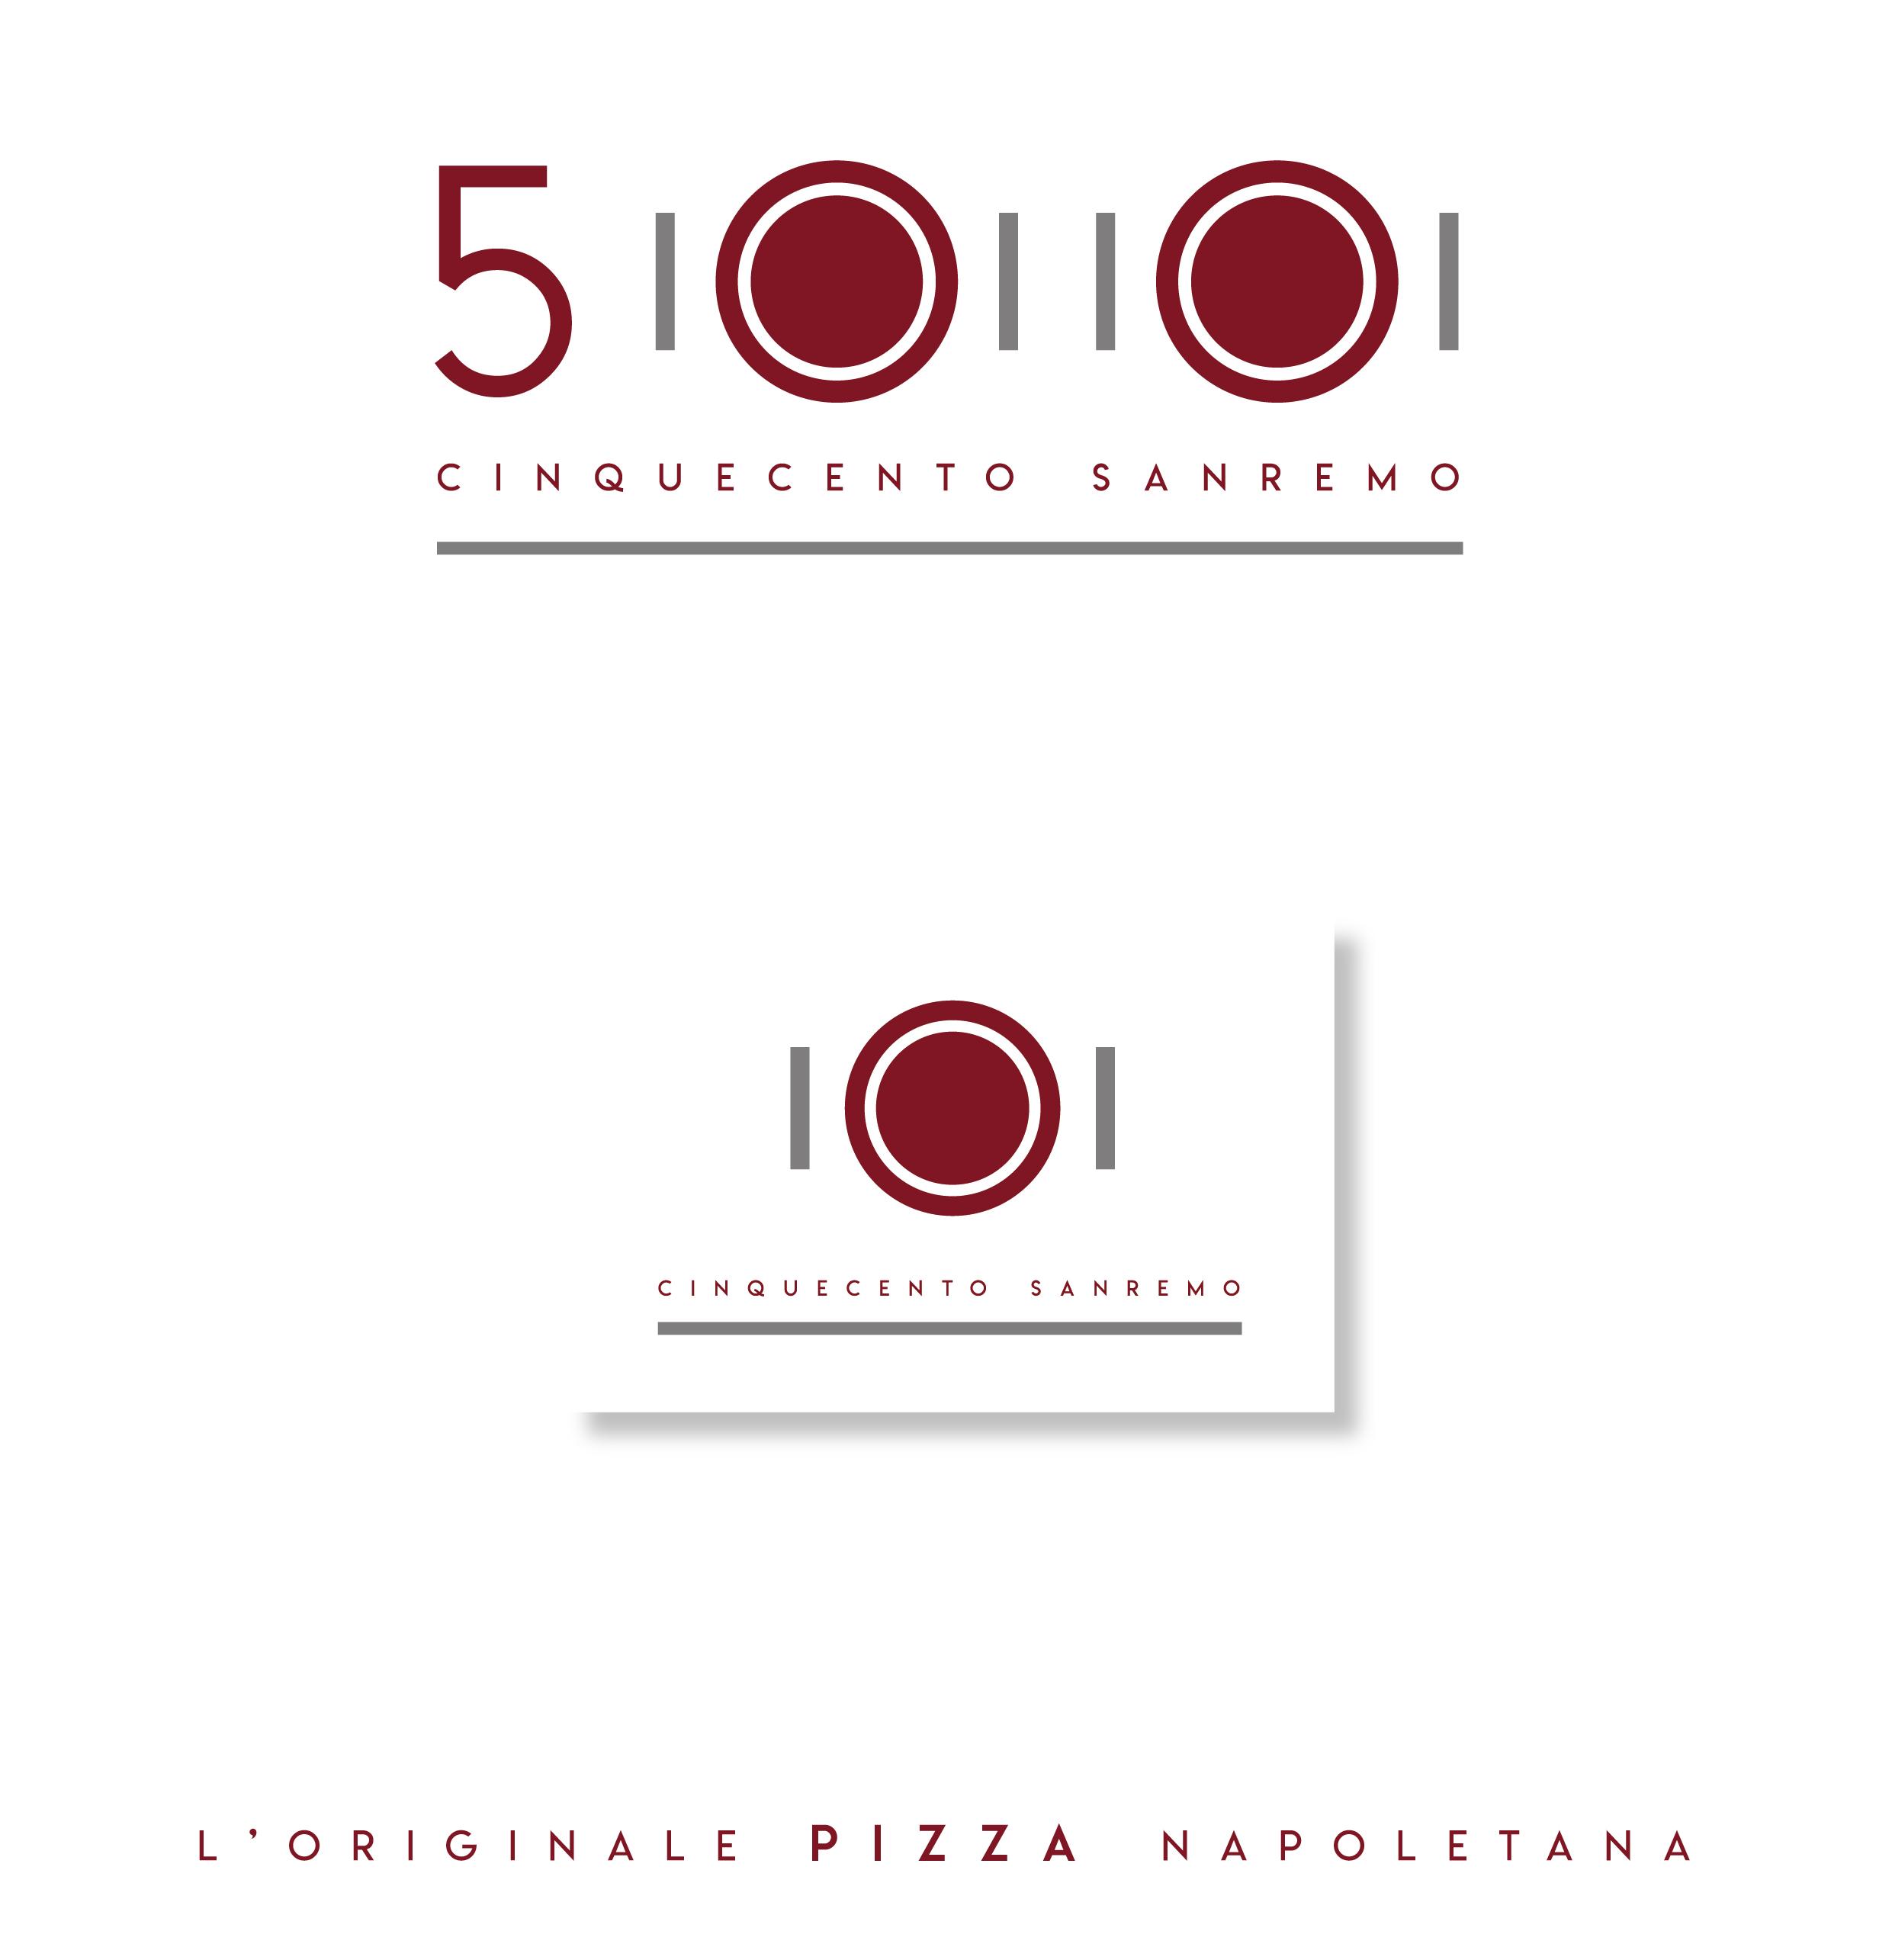 agenzia comunicazione Creazione logo aziendale bra cuneo restyling vecchio logo.jpg